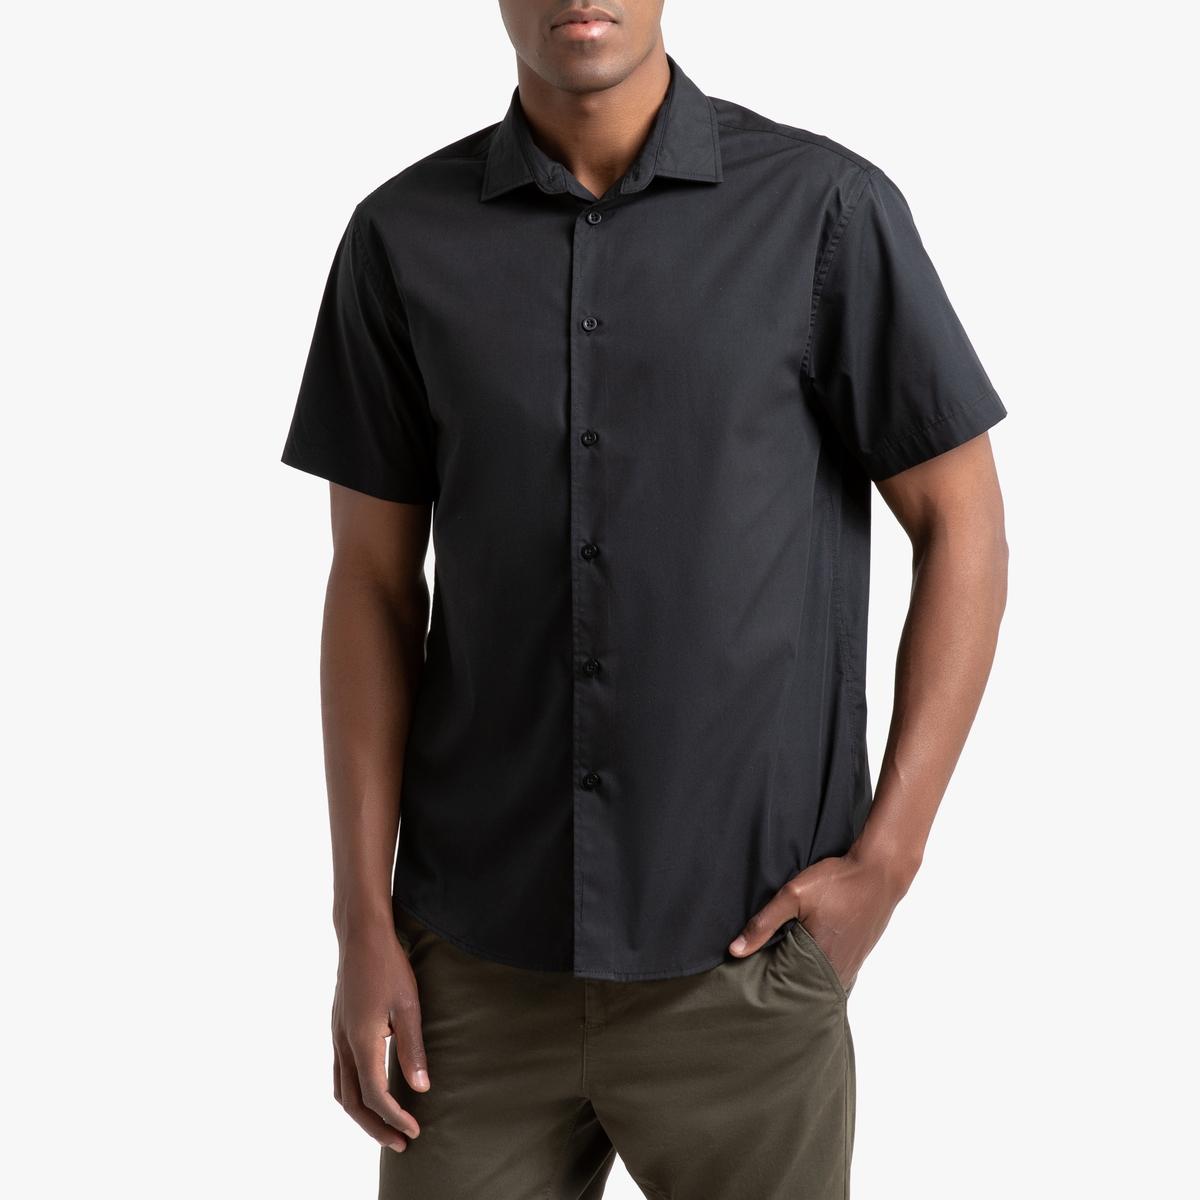 Рубашка LaRedoute Прямого покроя с короткими рукавами Christophe 35/36 черный блузка laredoute прямого покроя с бахромой l бежевый